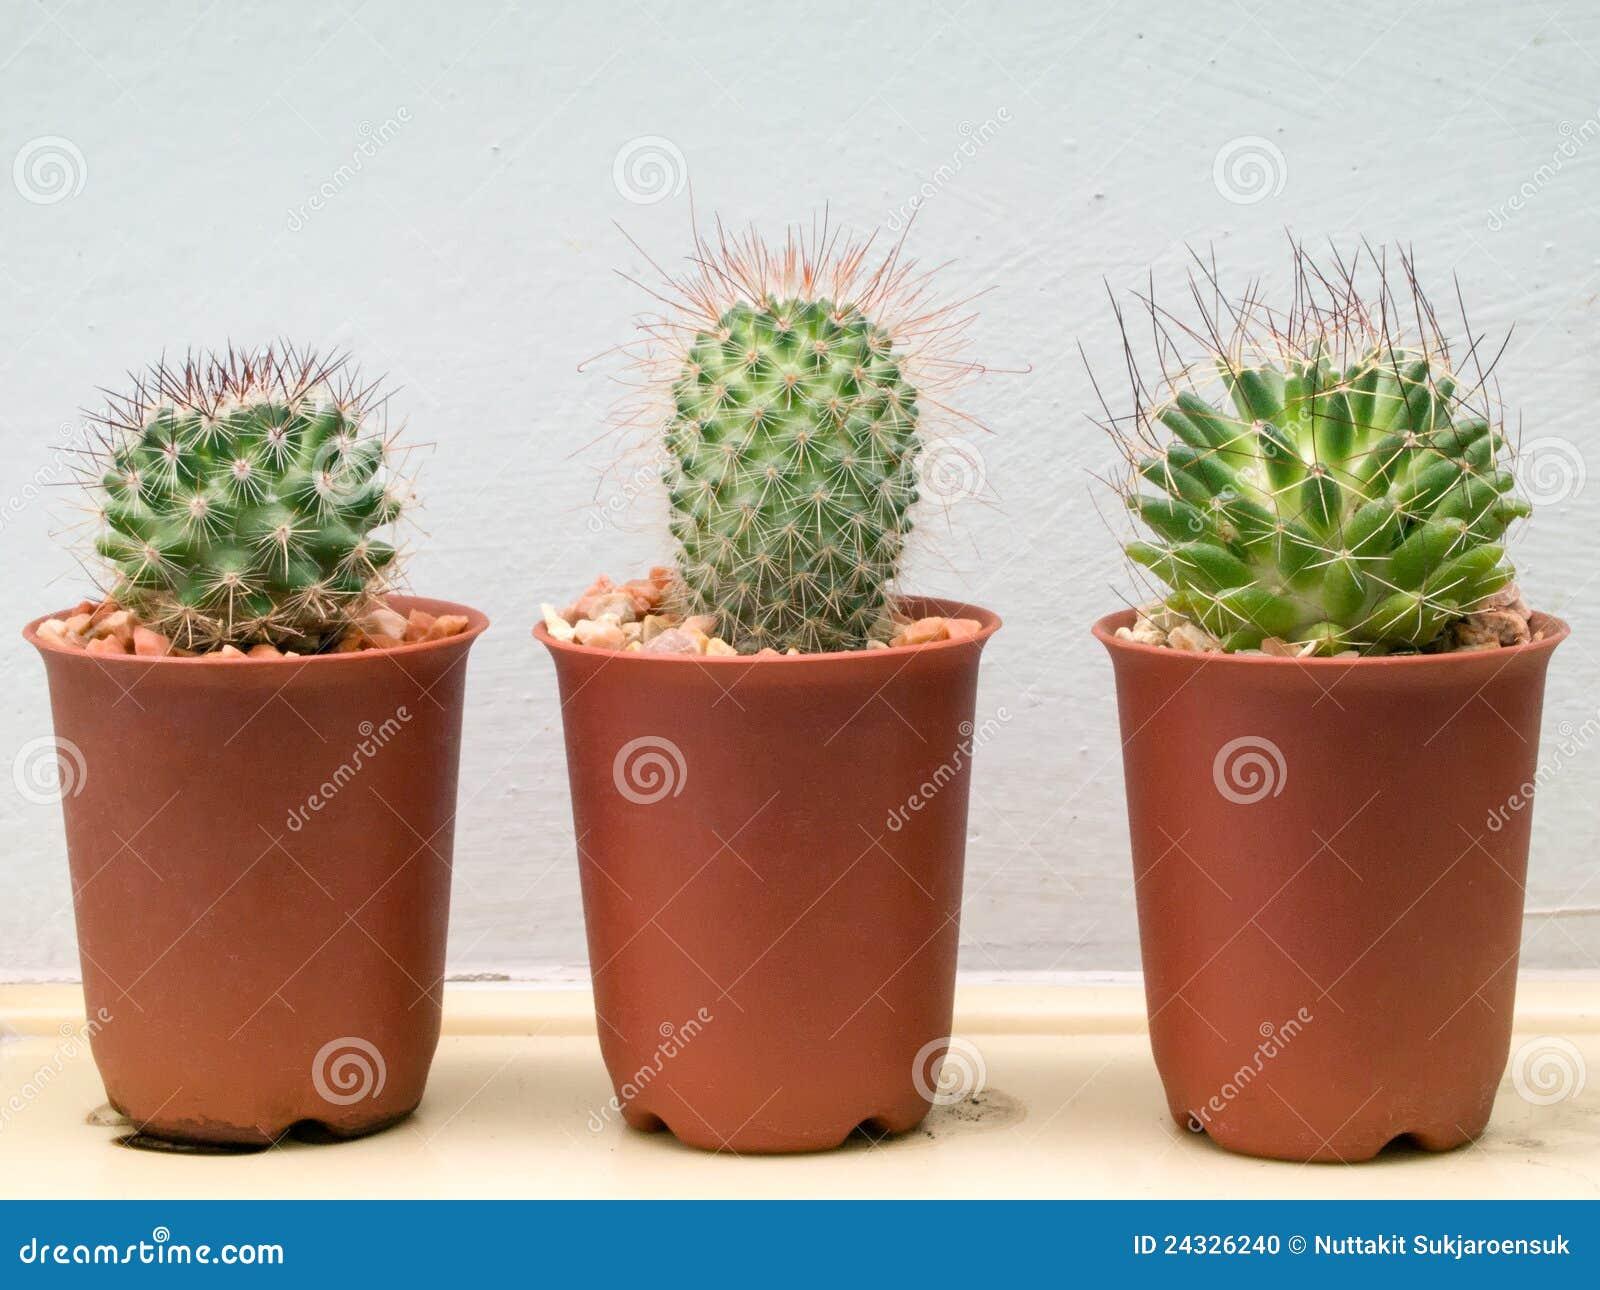 1000  ideas about Mini Cactus on Pinterest | Mini cactus garden ...